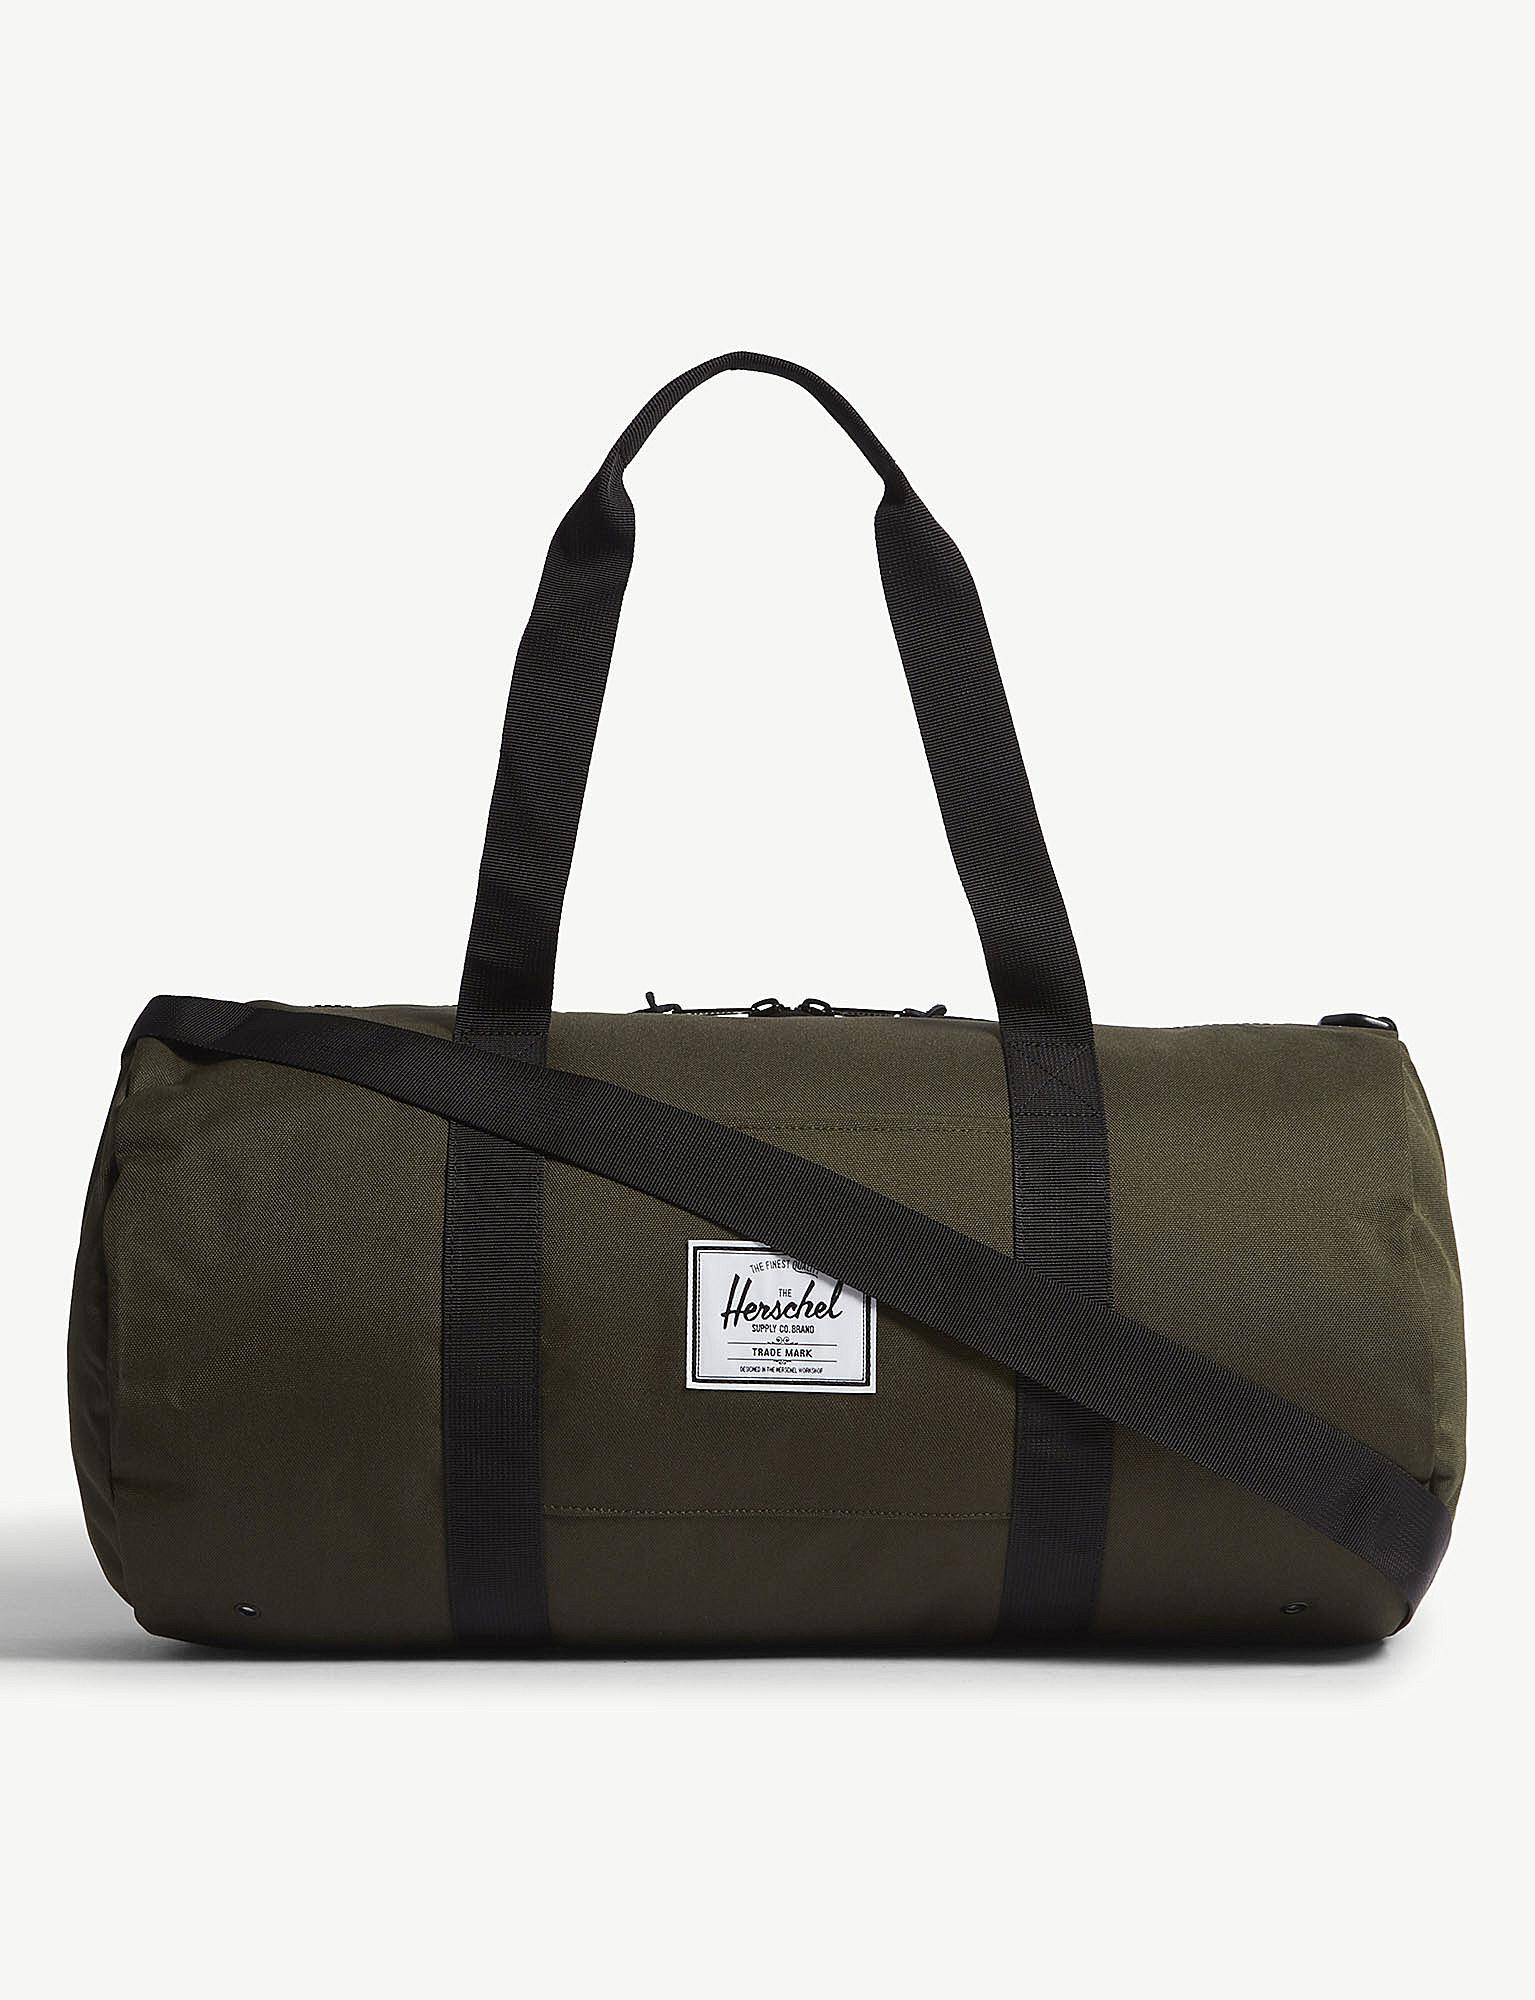 31f0d89e7635 Lyst - Herschel Supply Co. . Green Co. Sutton Duffel Bag in Black ...